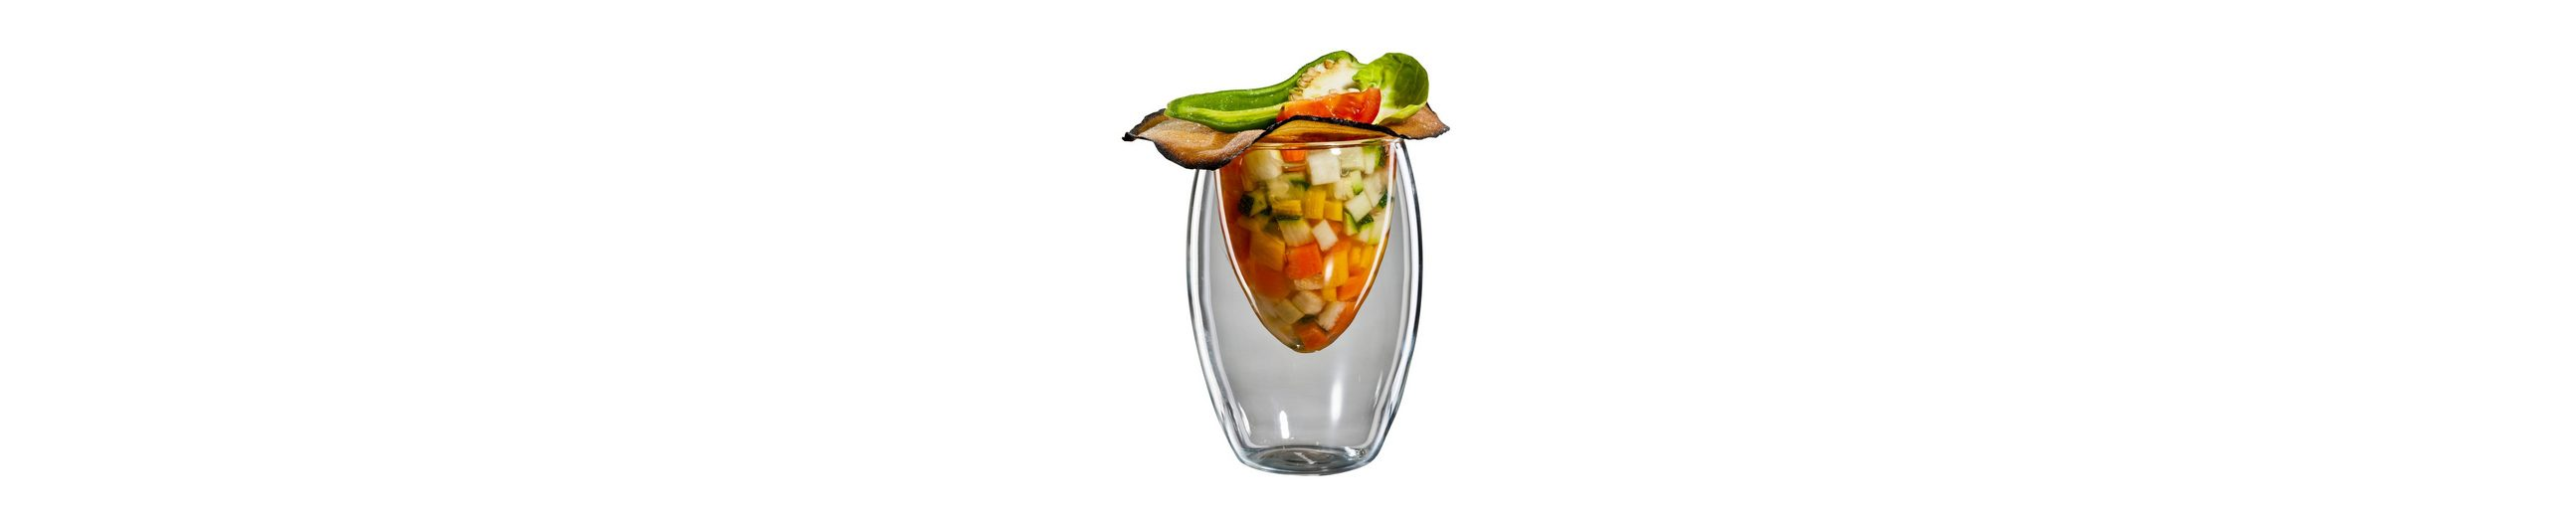 bloomix Catering-Gläser, 6er Set, »Ovo Grand«